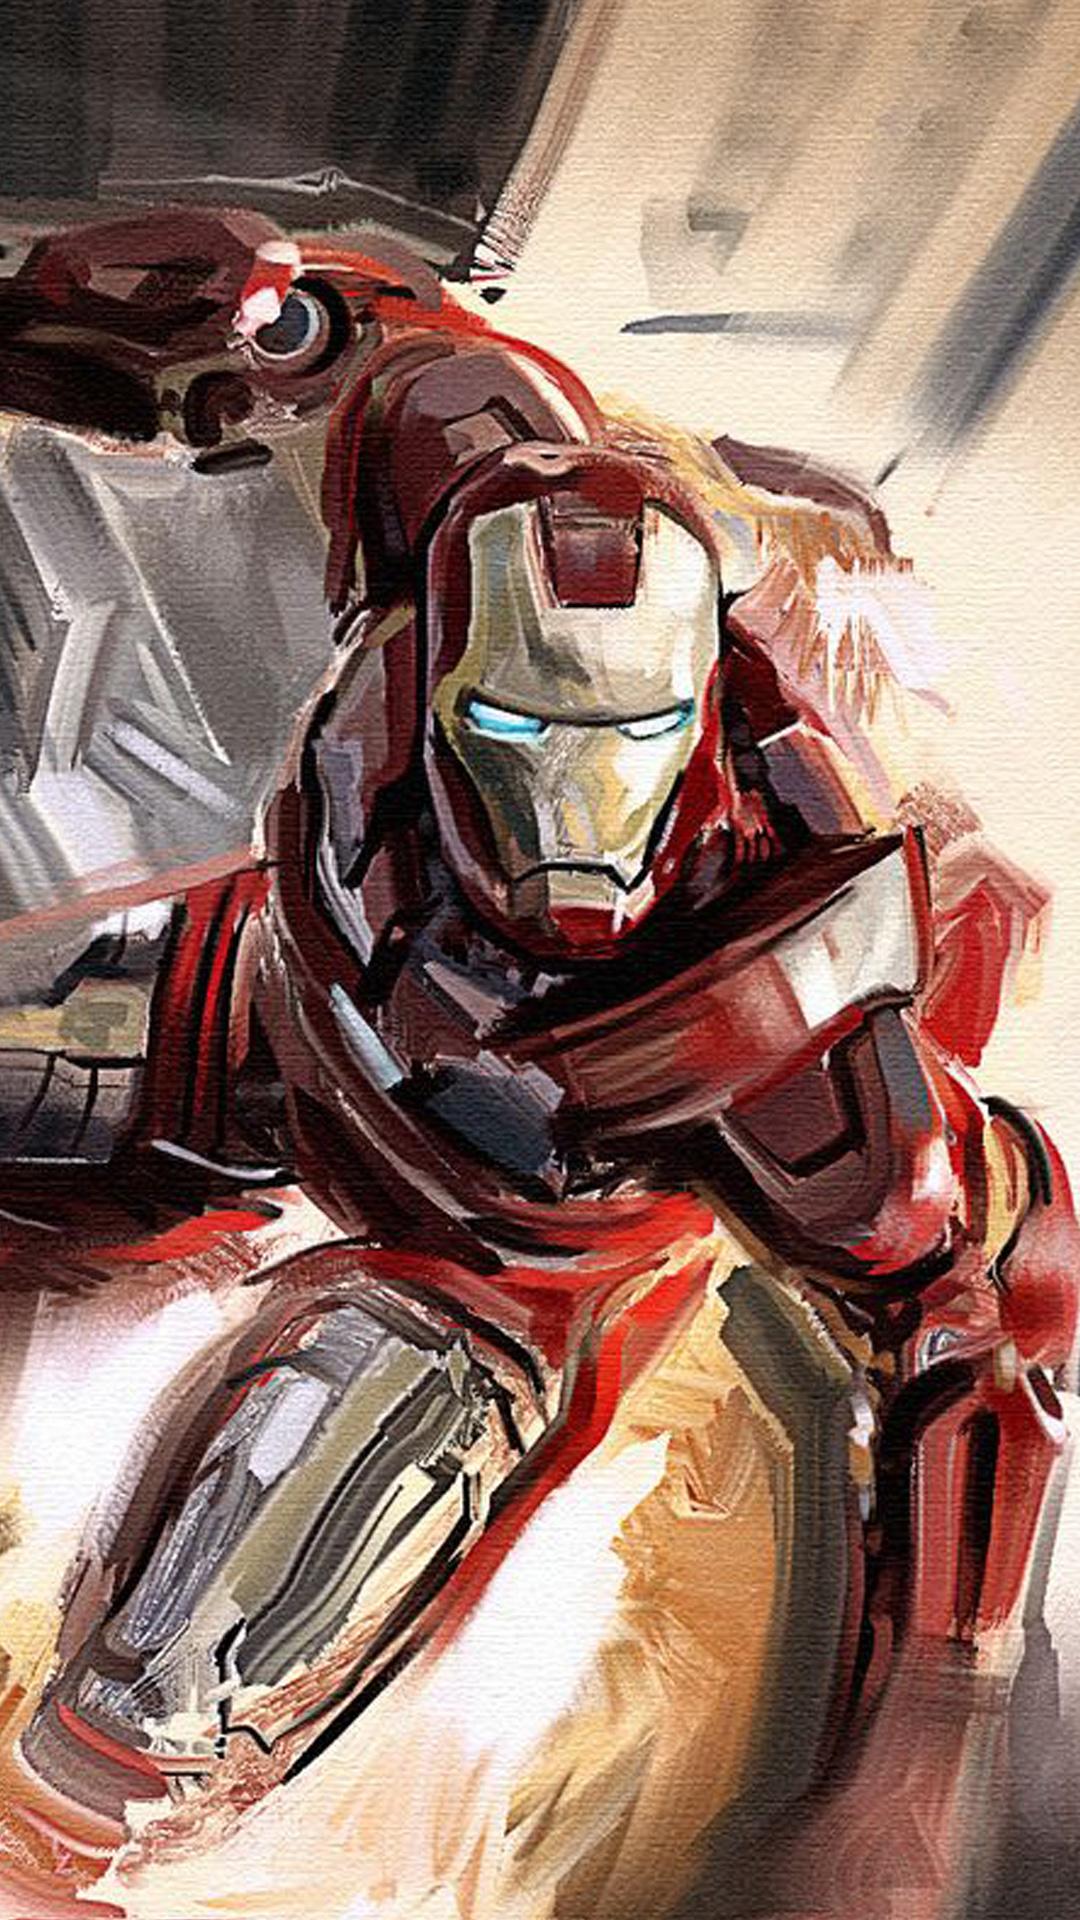 Iron Man Wallpaper Iron Man iphone wallpaper app ...